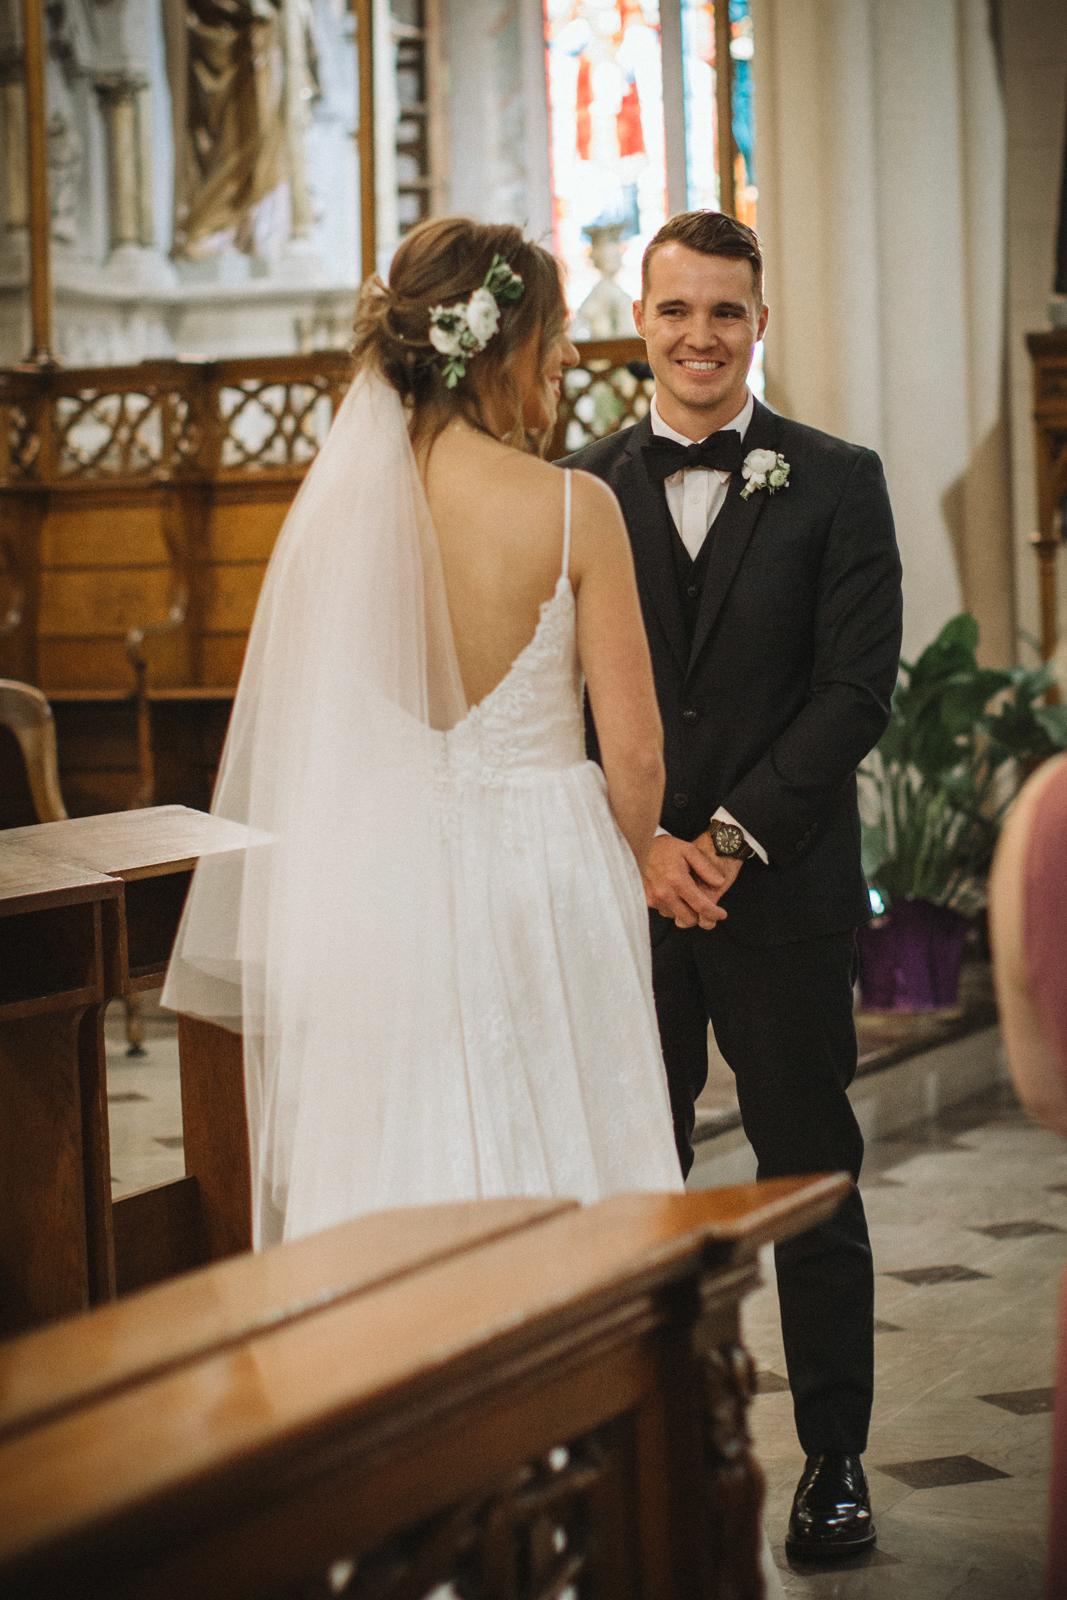 BeanandCole.com-Chris&JackieJohnson-Wedding-2014.jpg